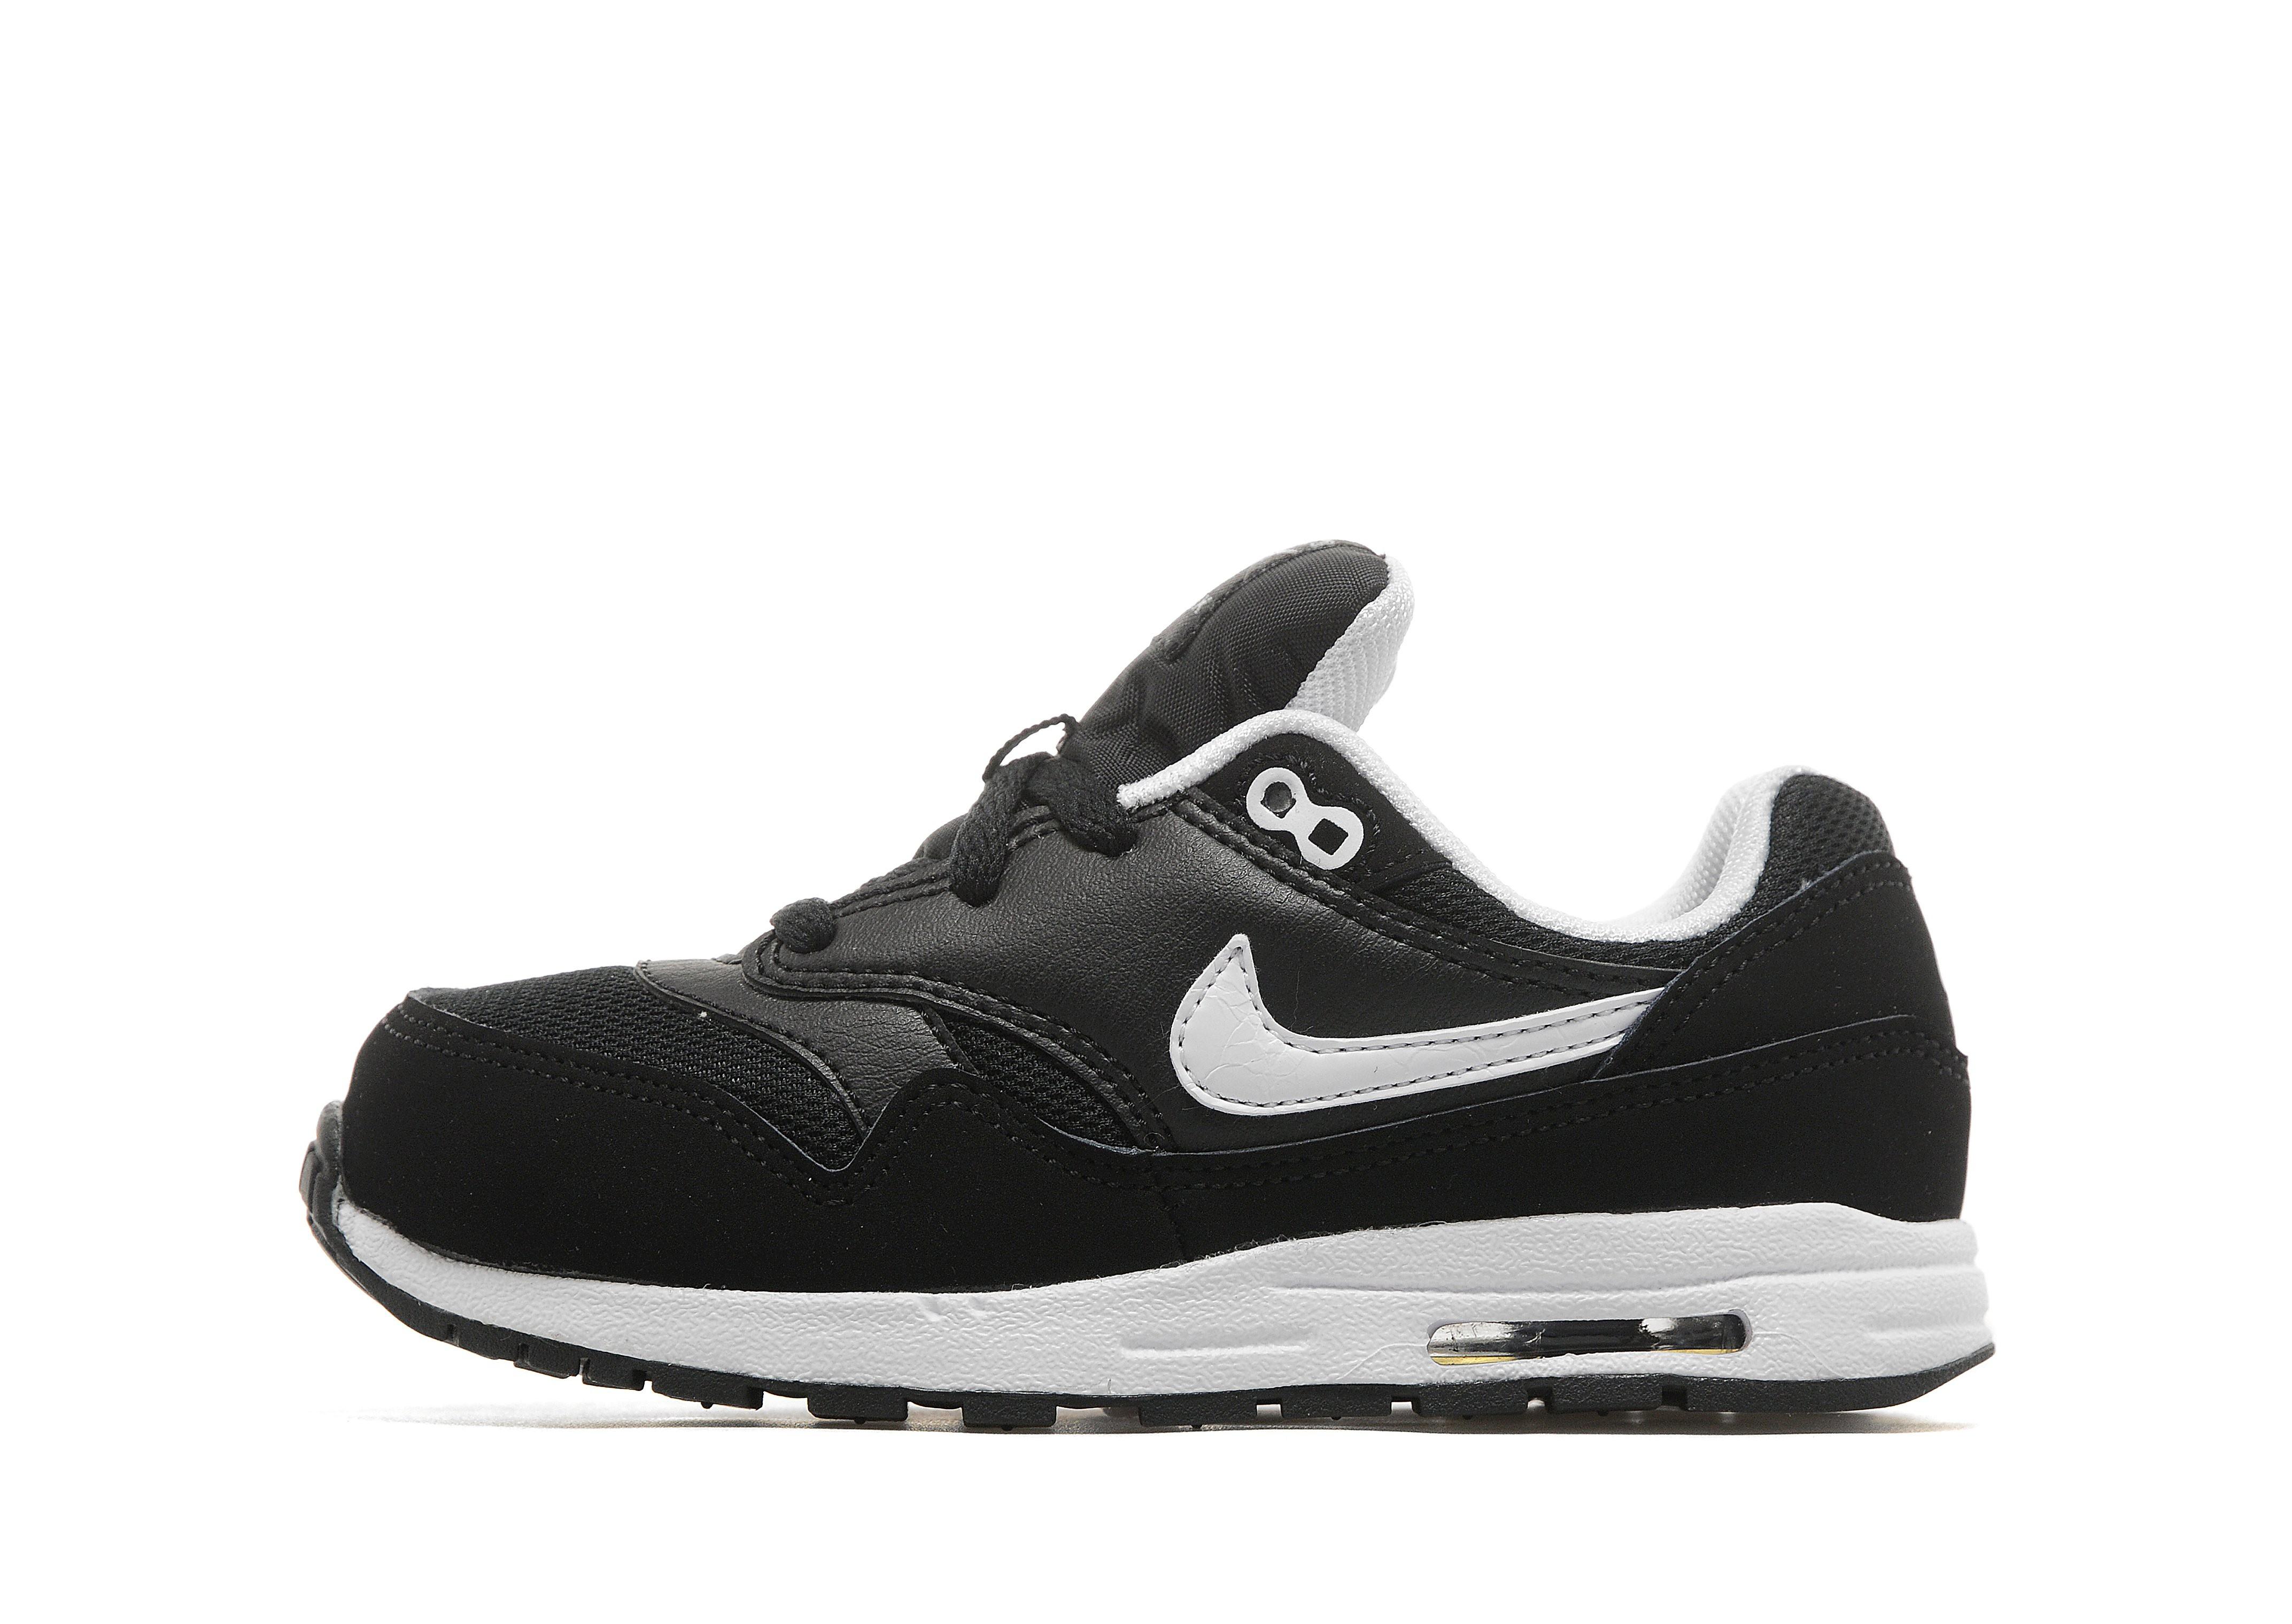 Nike Air Max 1 Baby's